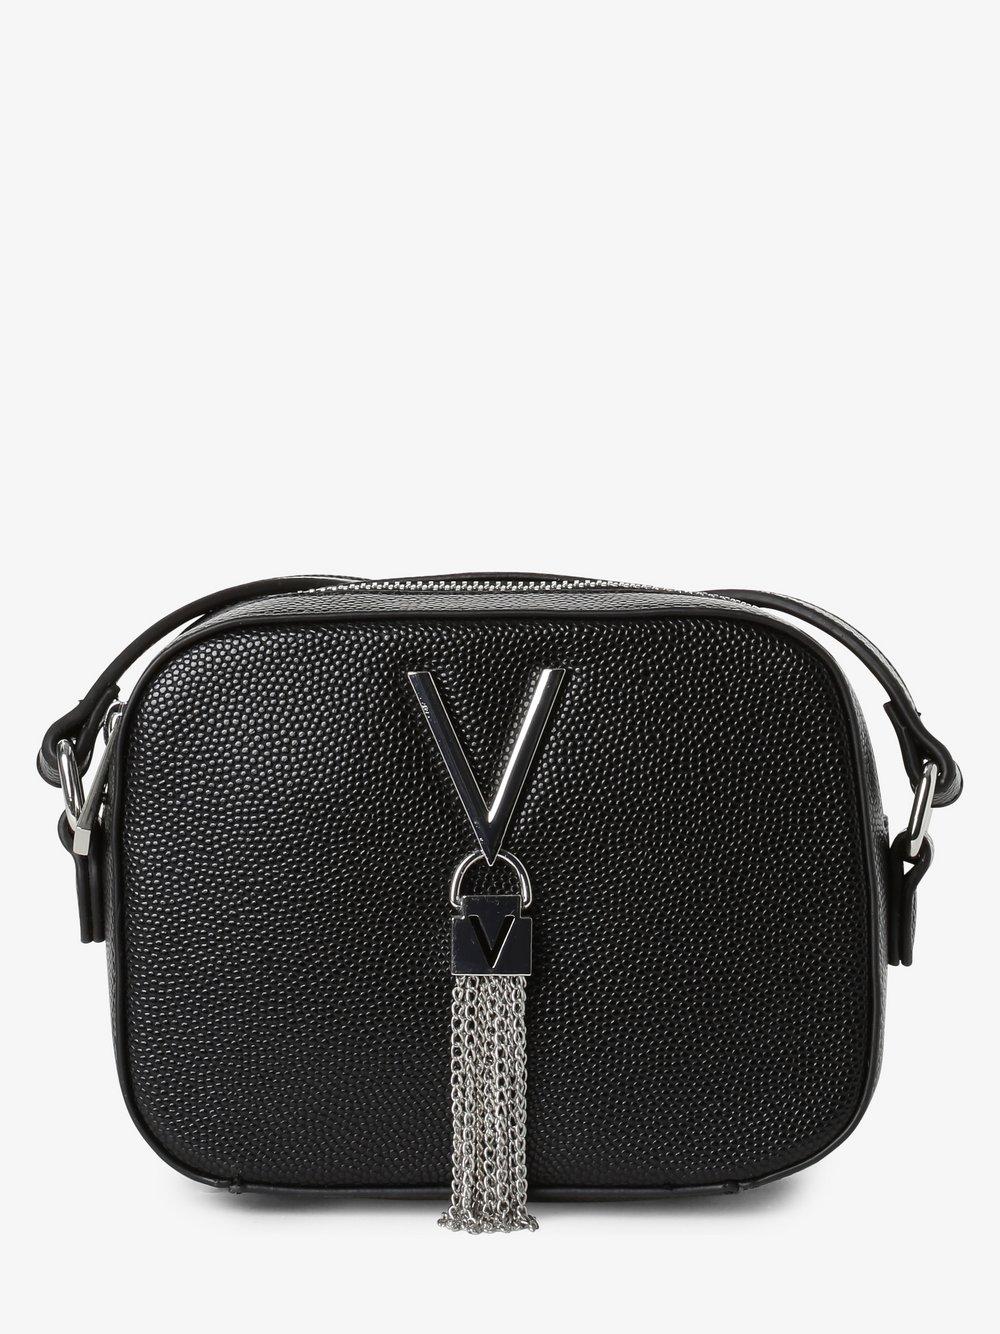 VALENTINO HANDBAGS – Damska torba na ramię – Divina, czarny Van Graaf 476483-0001-00000